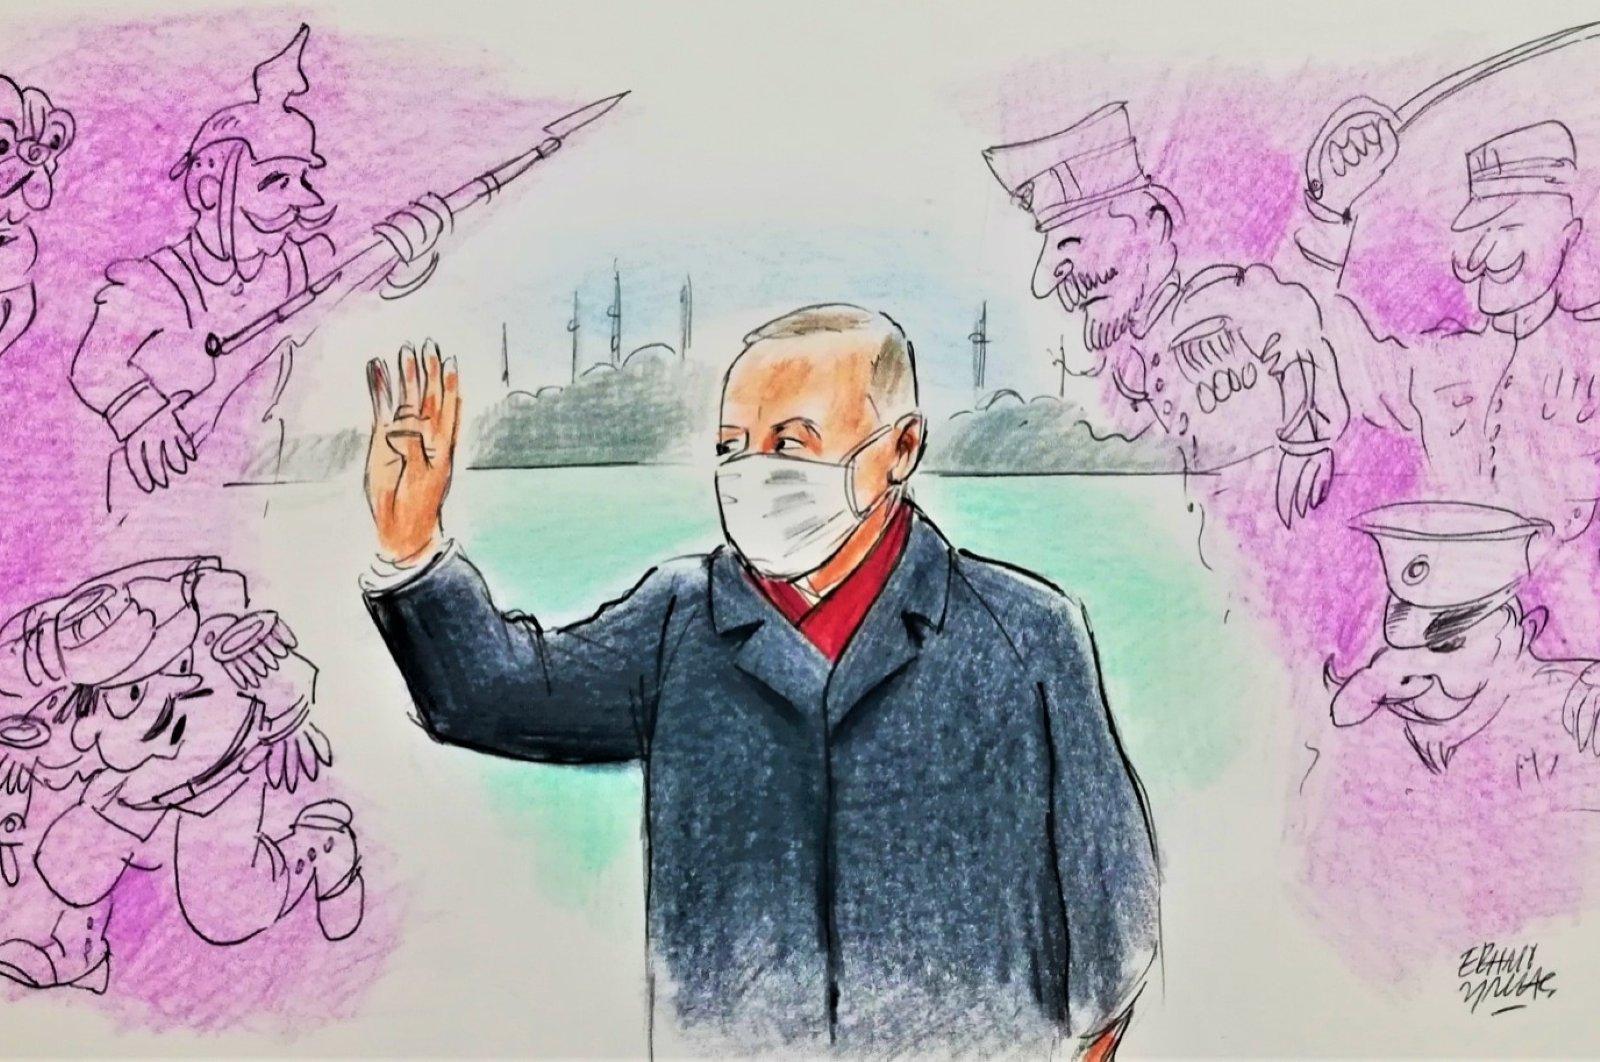 Illustration by Erhan Yalvaç